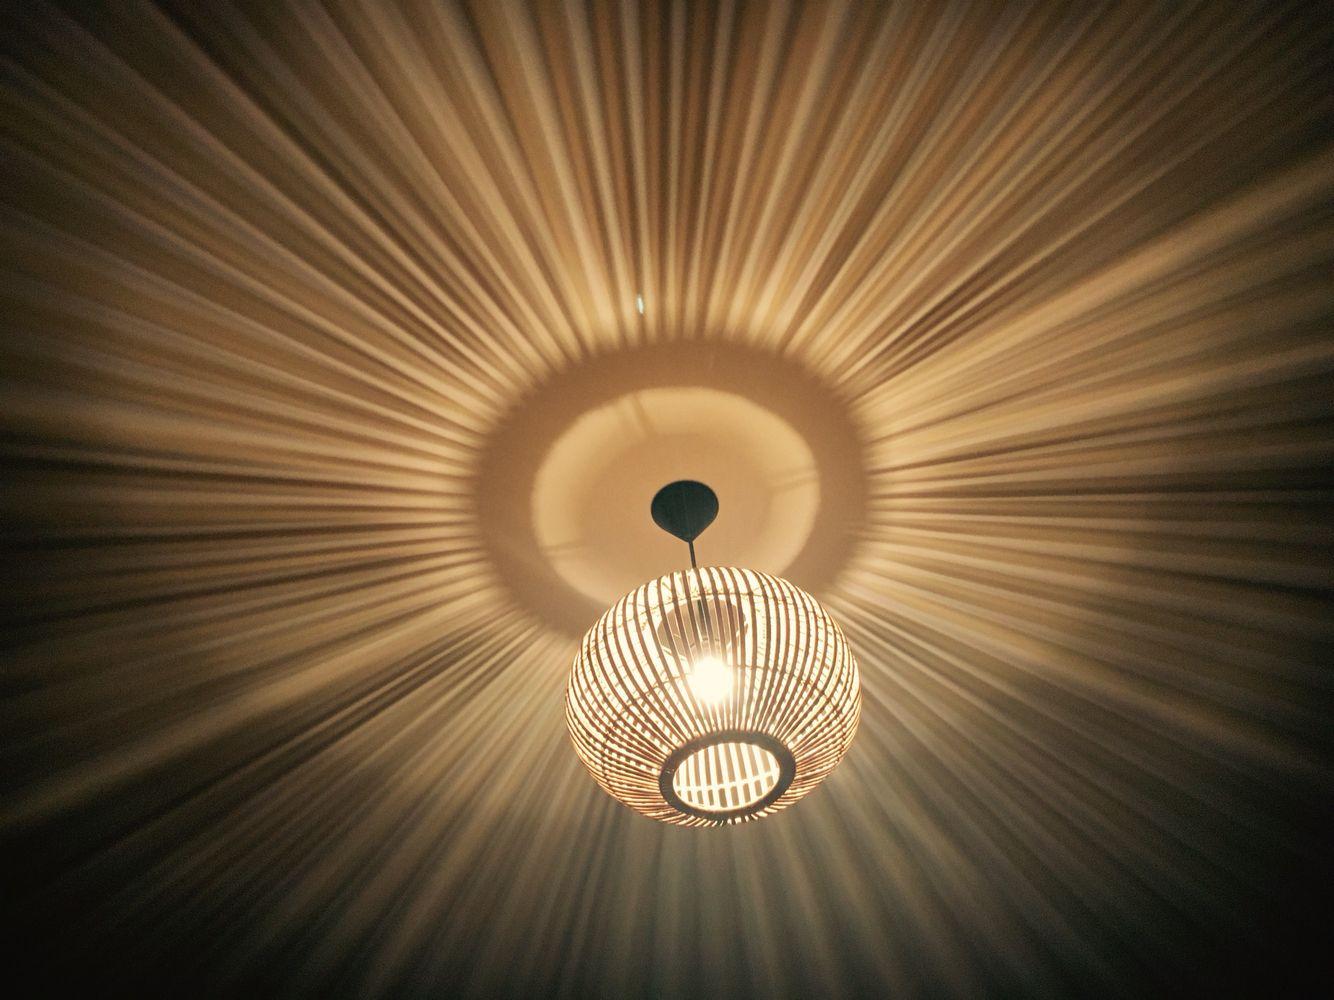 Marokkaanse Lampen Xenos : Magisch licht op mijn slaapkamer bamboe lamp van xenos ✨ kas